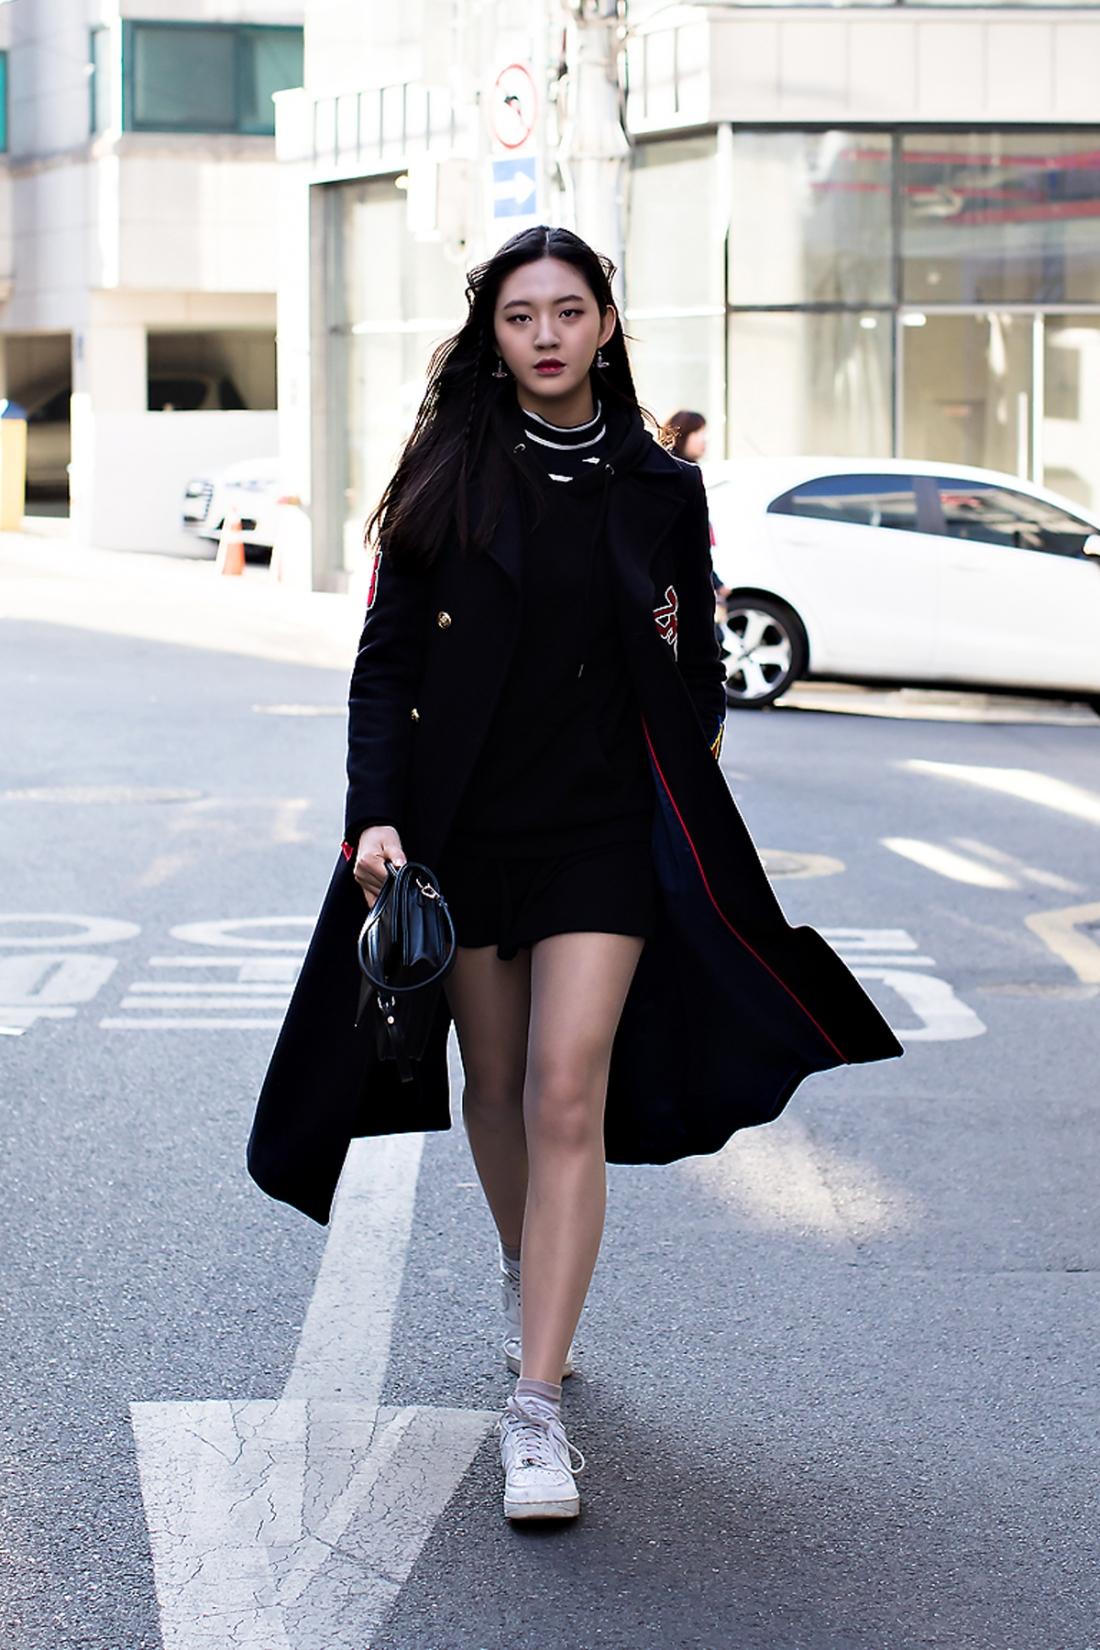 Oh Yoonseo, Street Fashion 2017 in SEOUL.jpg